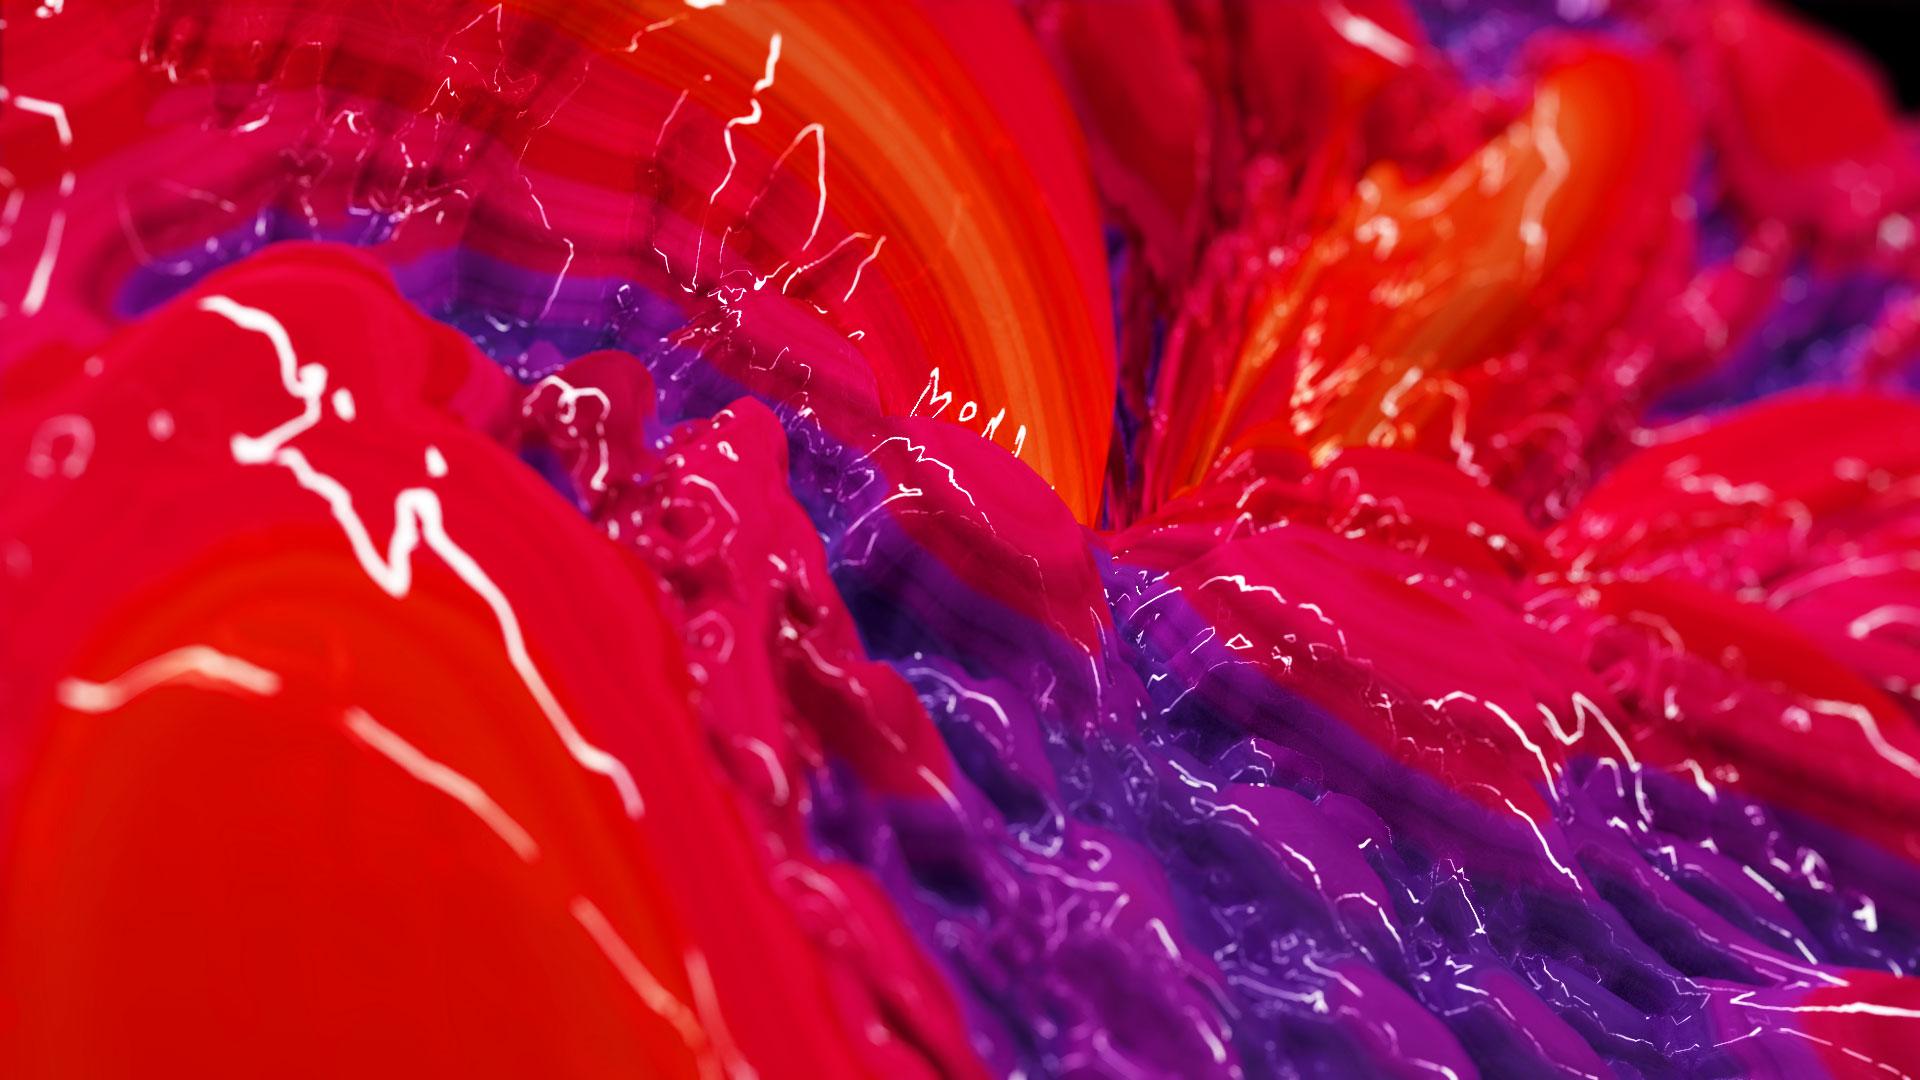 tao-plastic-vortex-psy-(0-00-02-28).jpg